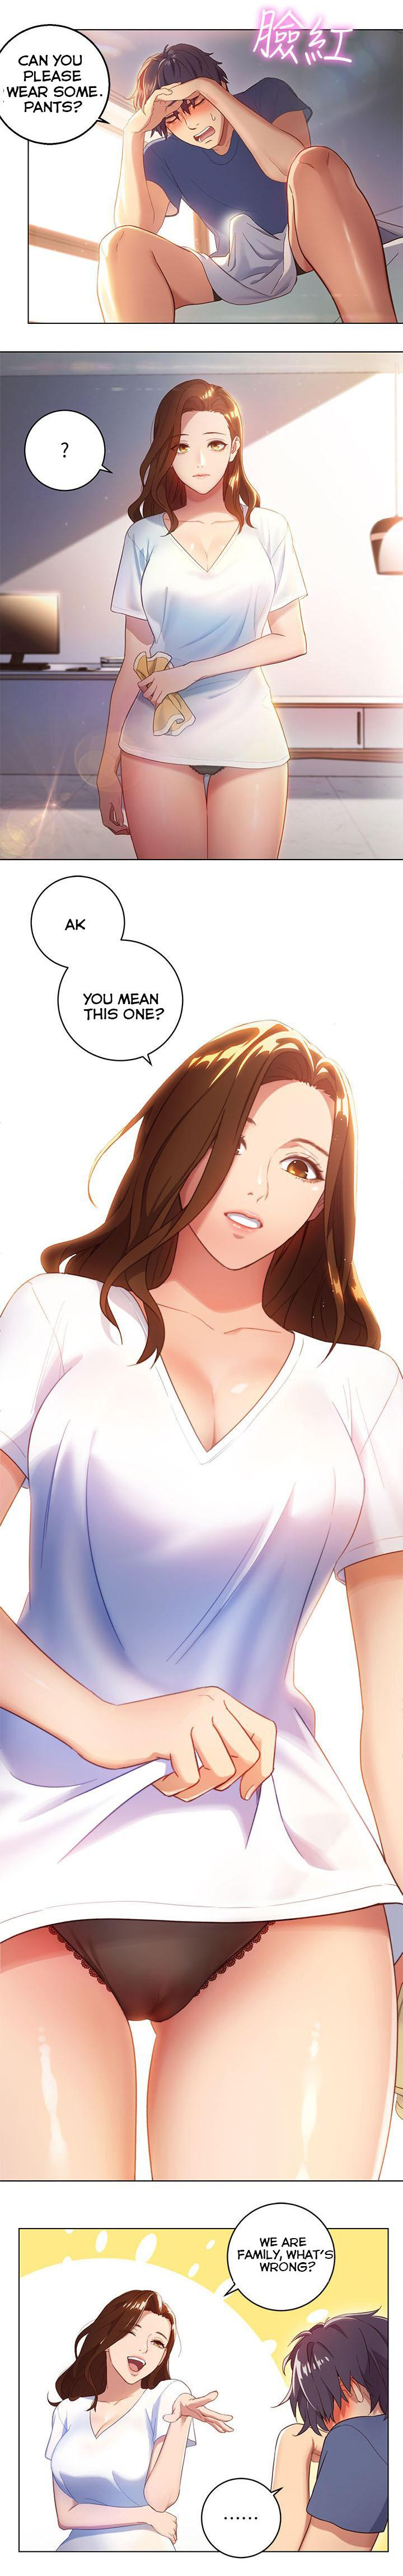 [Neck Pilllow] Stepmother Friends Ch.39/? [English] [Hentai Universe] NEW! 13/10/2020 9